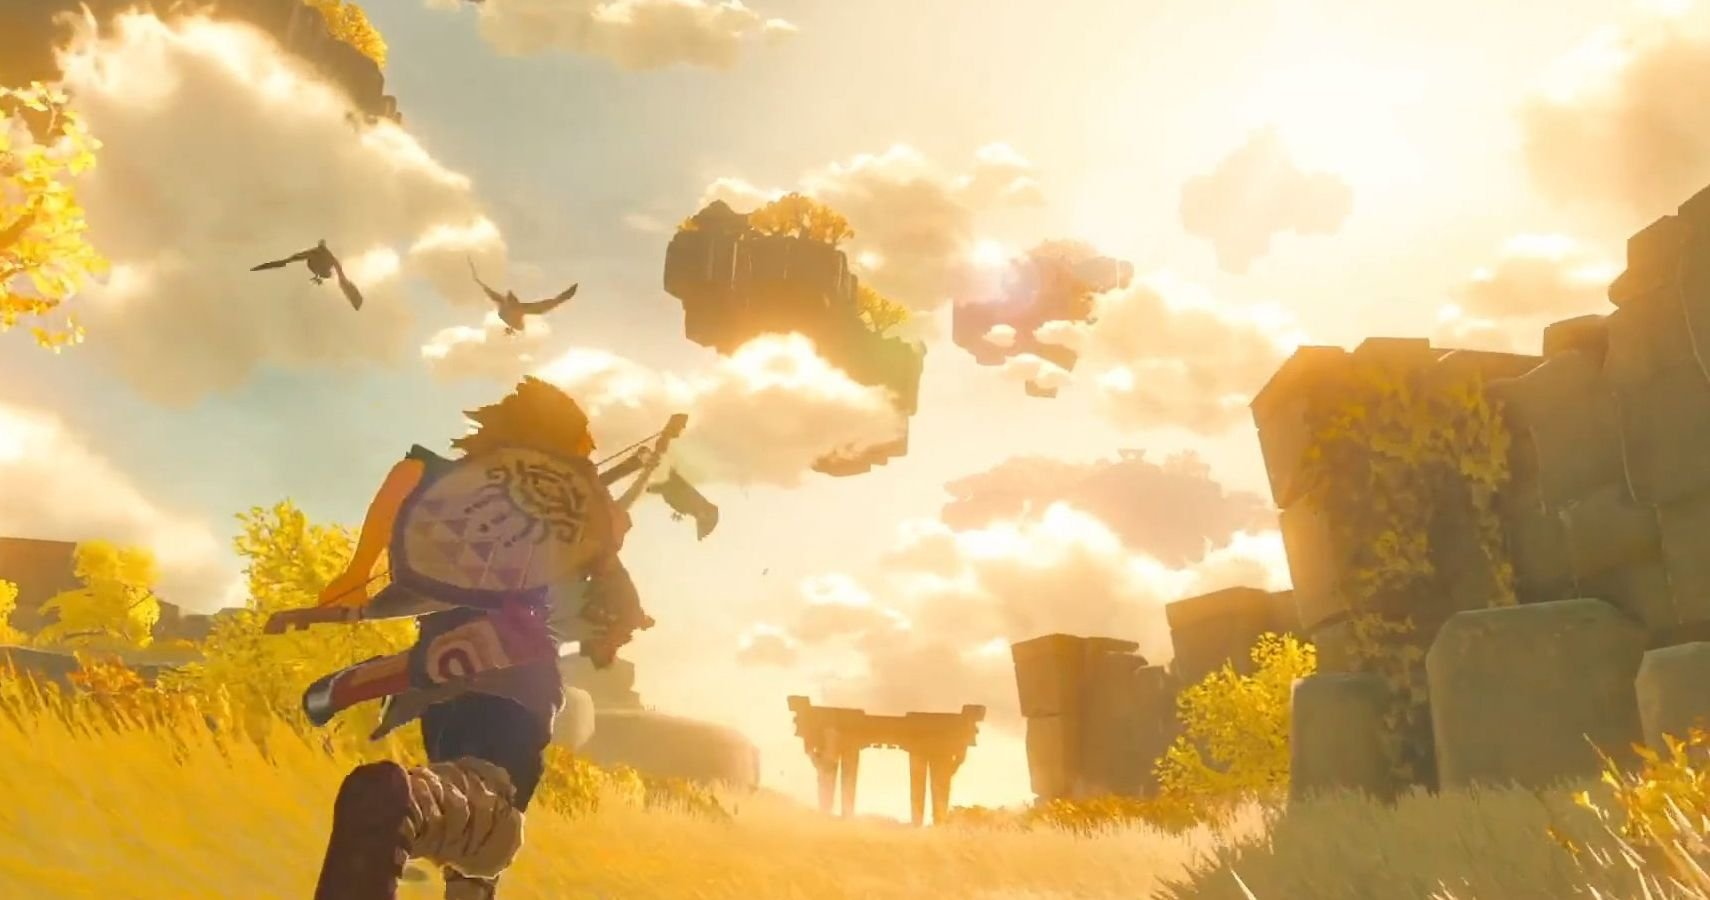 Breath Of The Wild 2 Launches In 2022, Nintendo Reveals New E3 Trailer